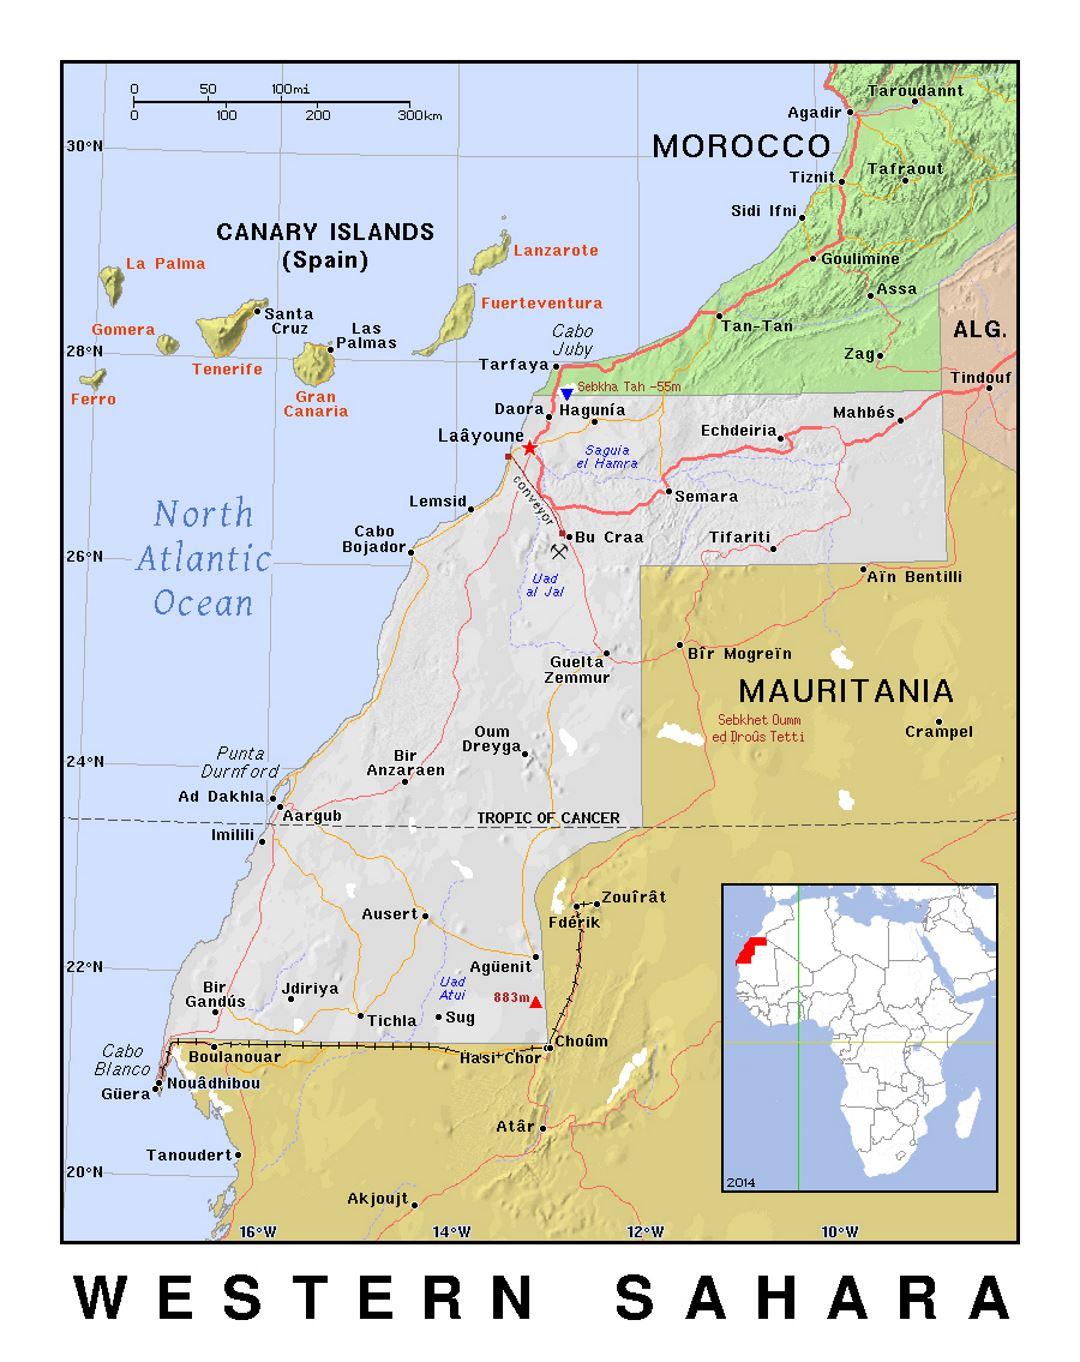 Detailed political map of Western Sahara with relief ... on arabian peninsula map, sudan map, namib map, congo basin map, great rift valley map, atlas mountains map, mecca map, gobi map, lake tanganyika map, zambezi river map, zagros mountains map, red sea map, kalahari map, madagascar map, desert map, sahel map, cape of good hope map, taurus mountains map, atacama map, africa map,